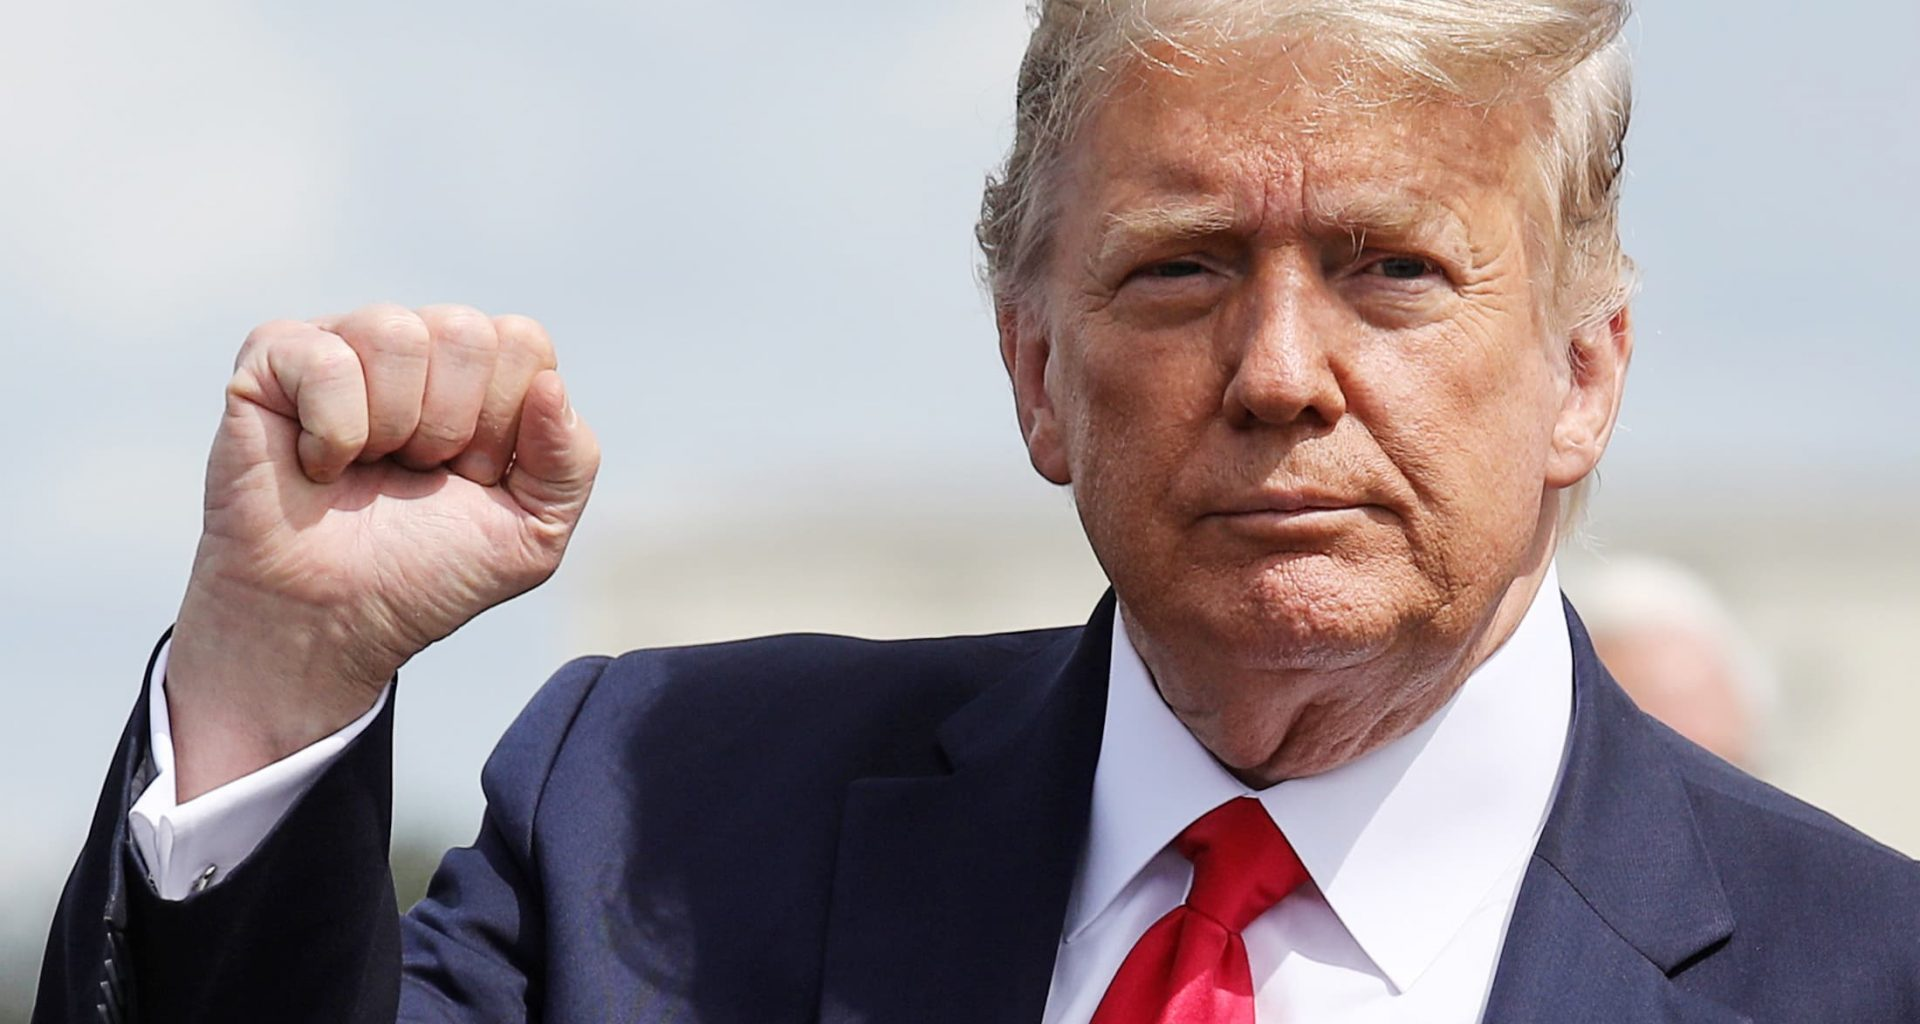 President Trump Issues WARNING